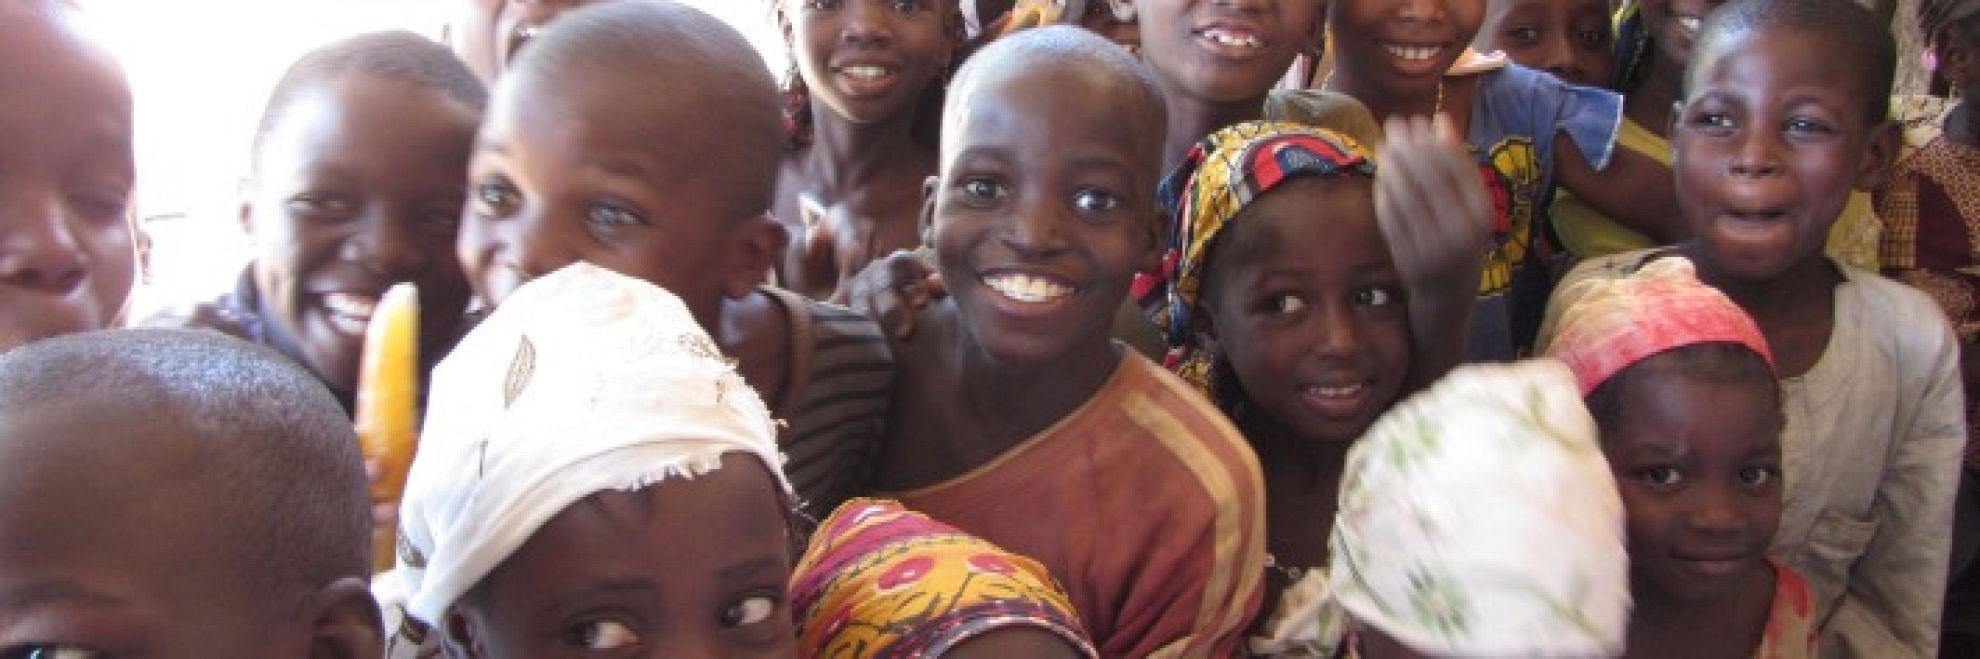 Latest News Optimism and energy the bill and melinda gates foundation malaria forum 2011